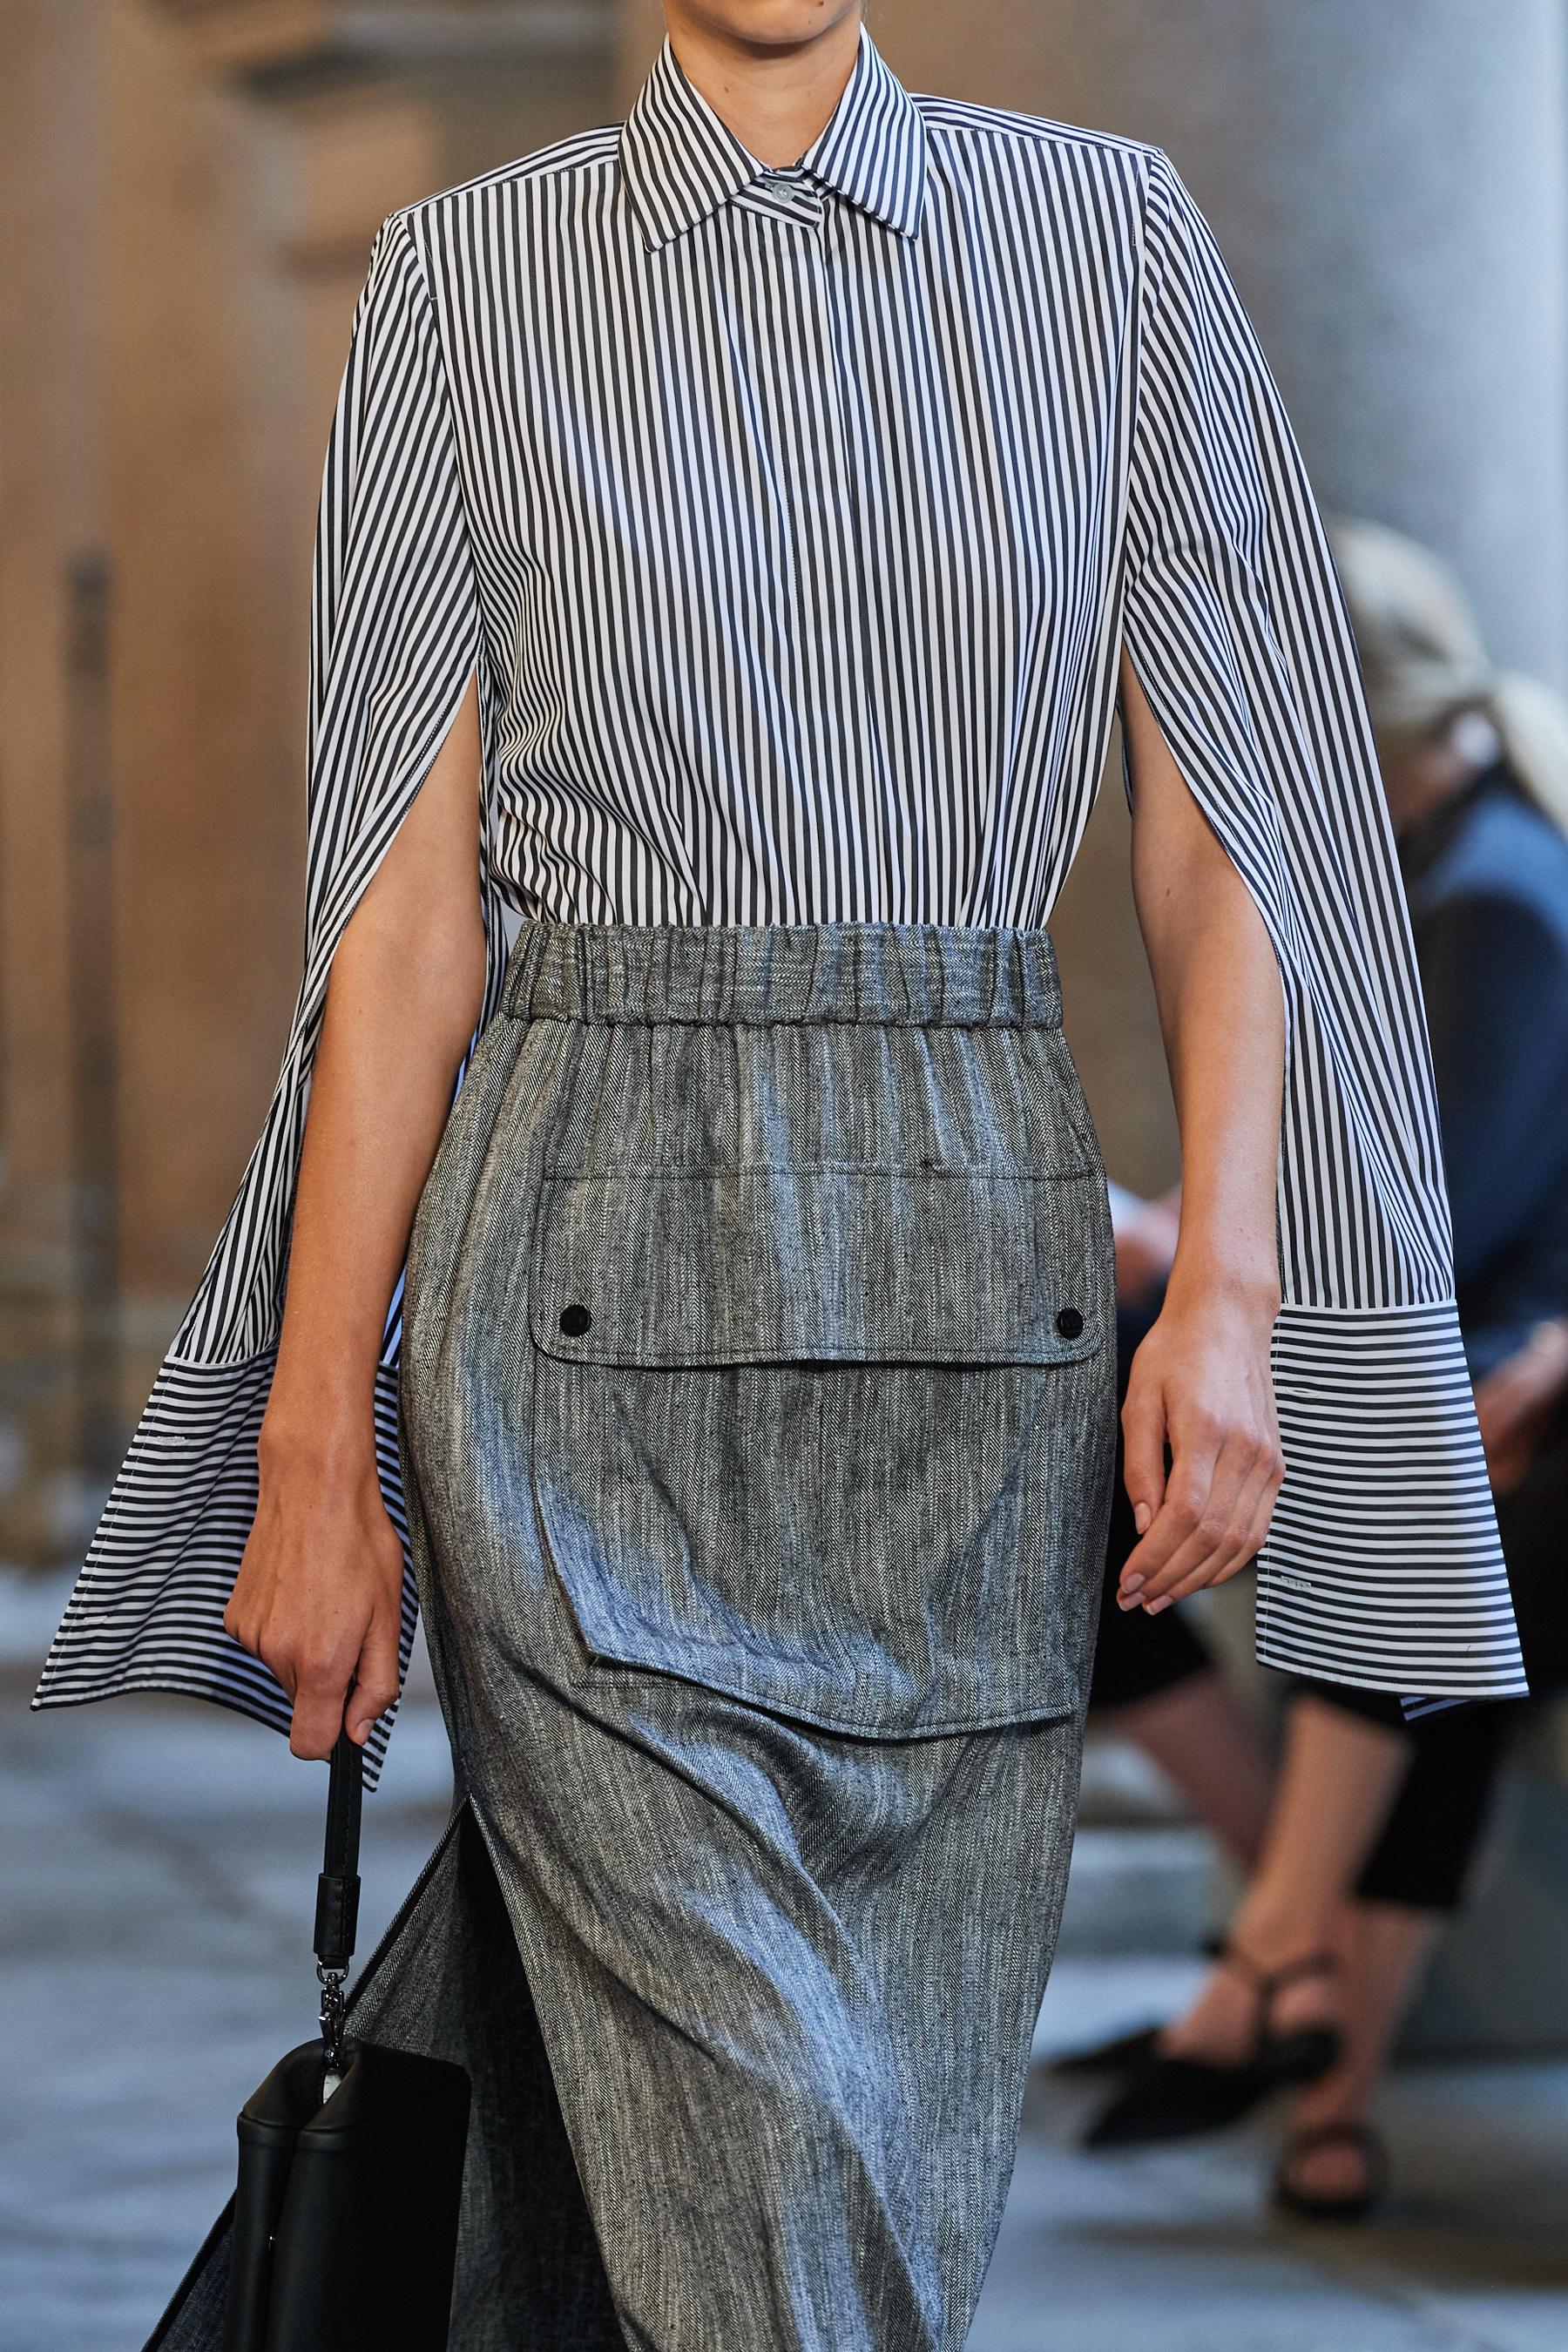 Max Mara Spring 2021 Fashion Show Photos